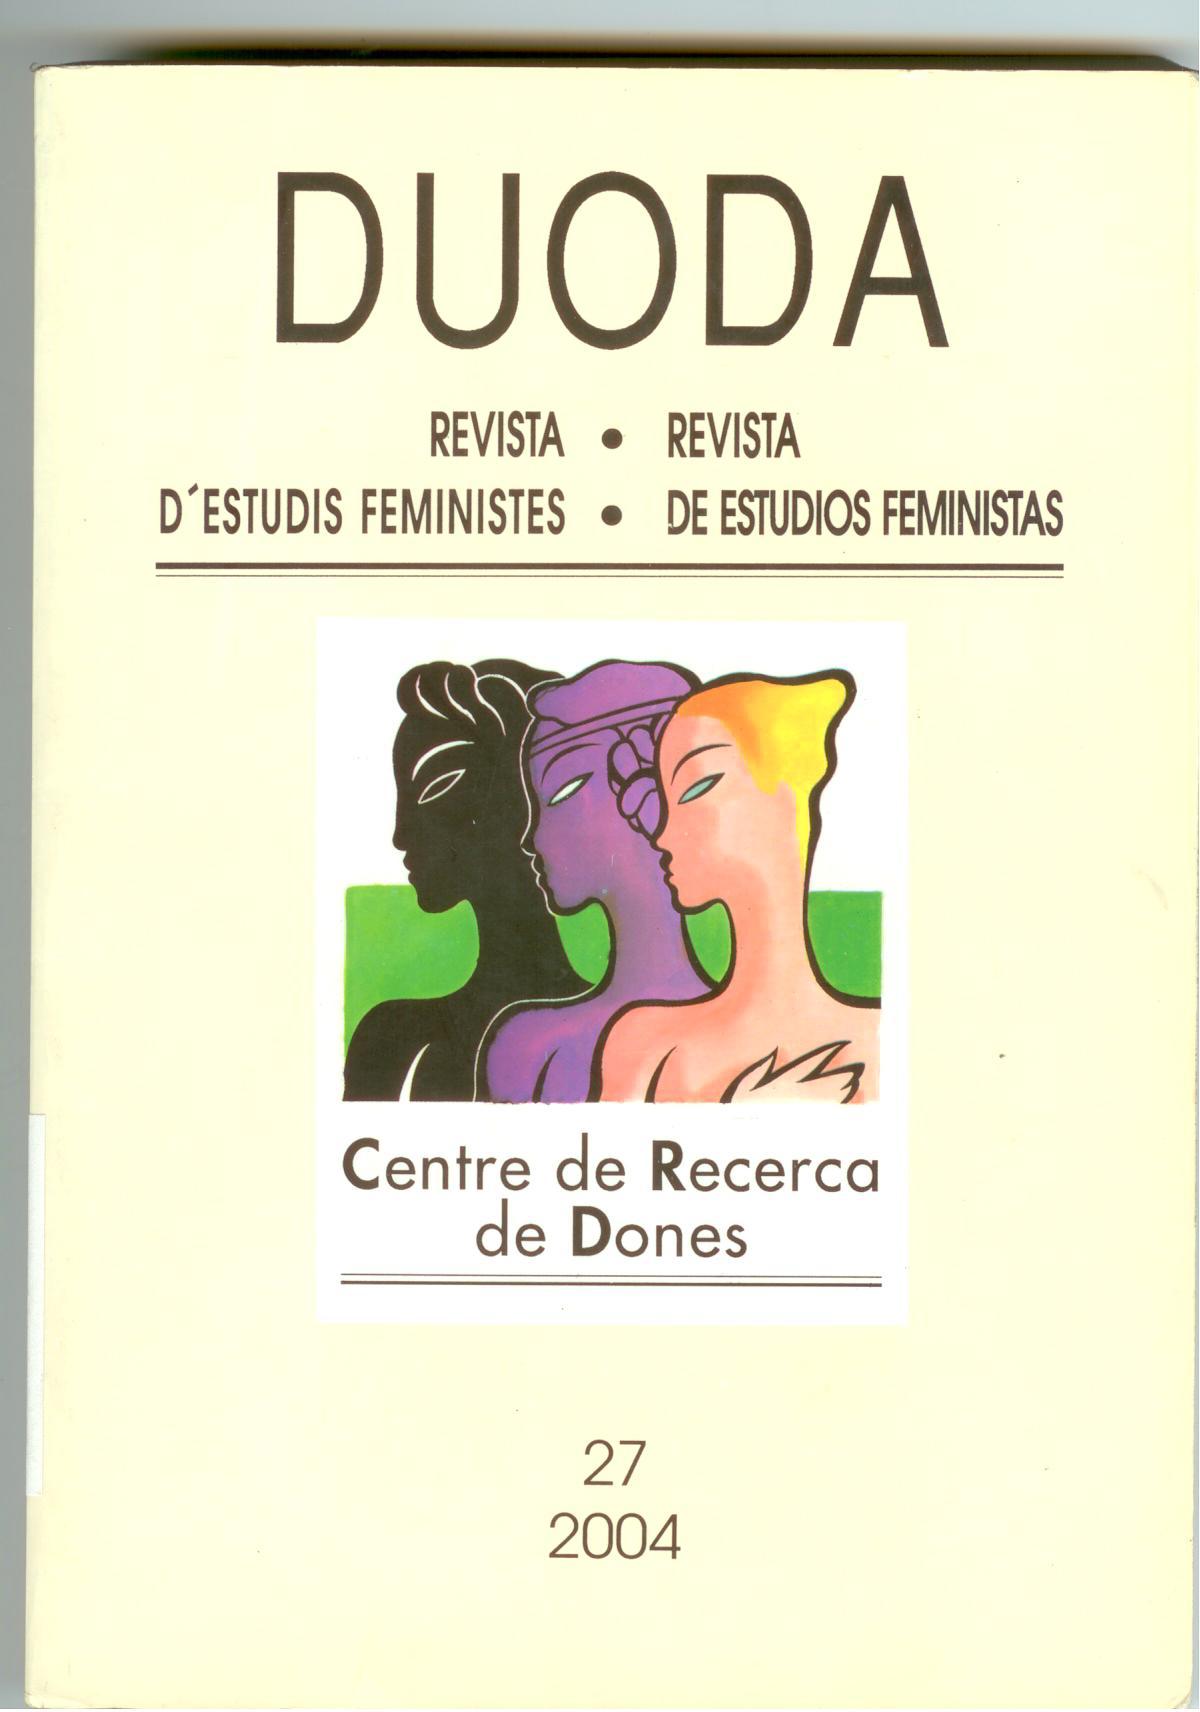 duoda-2004.jpg